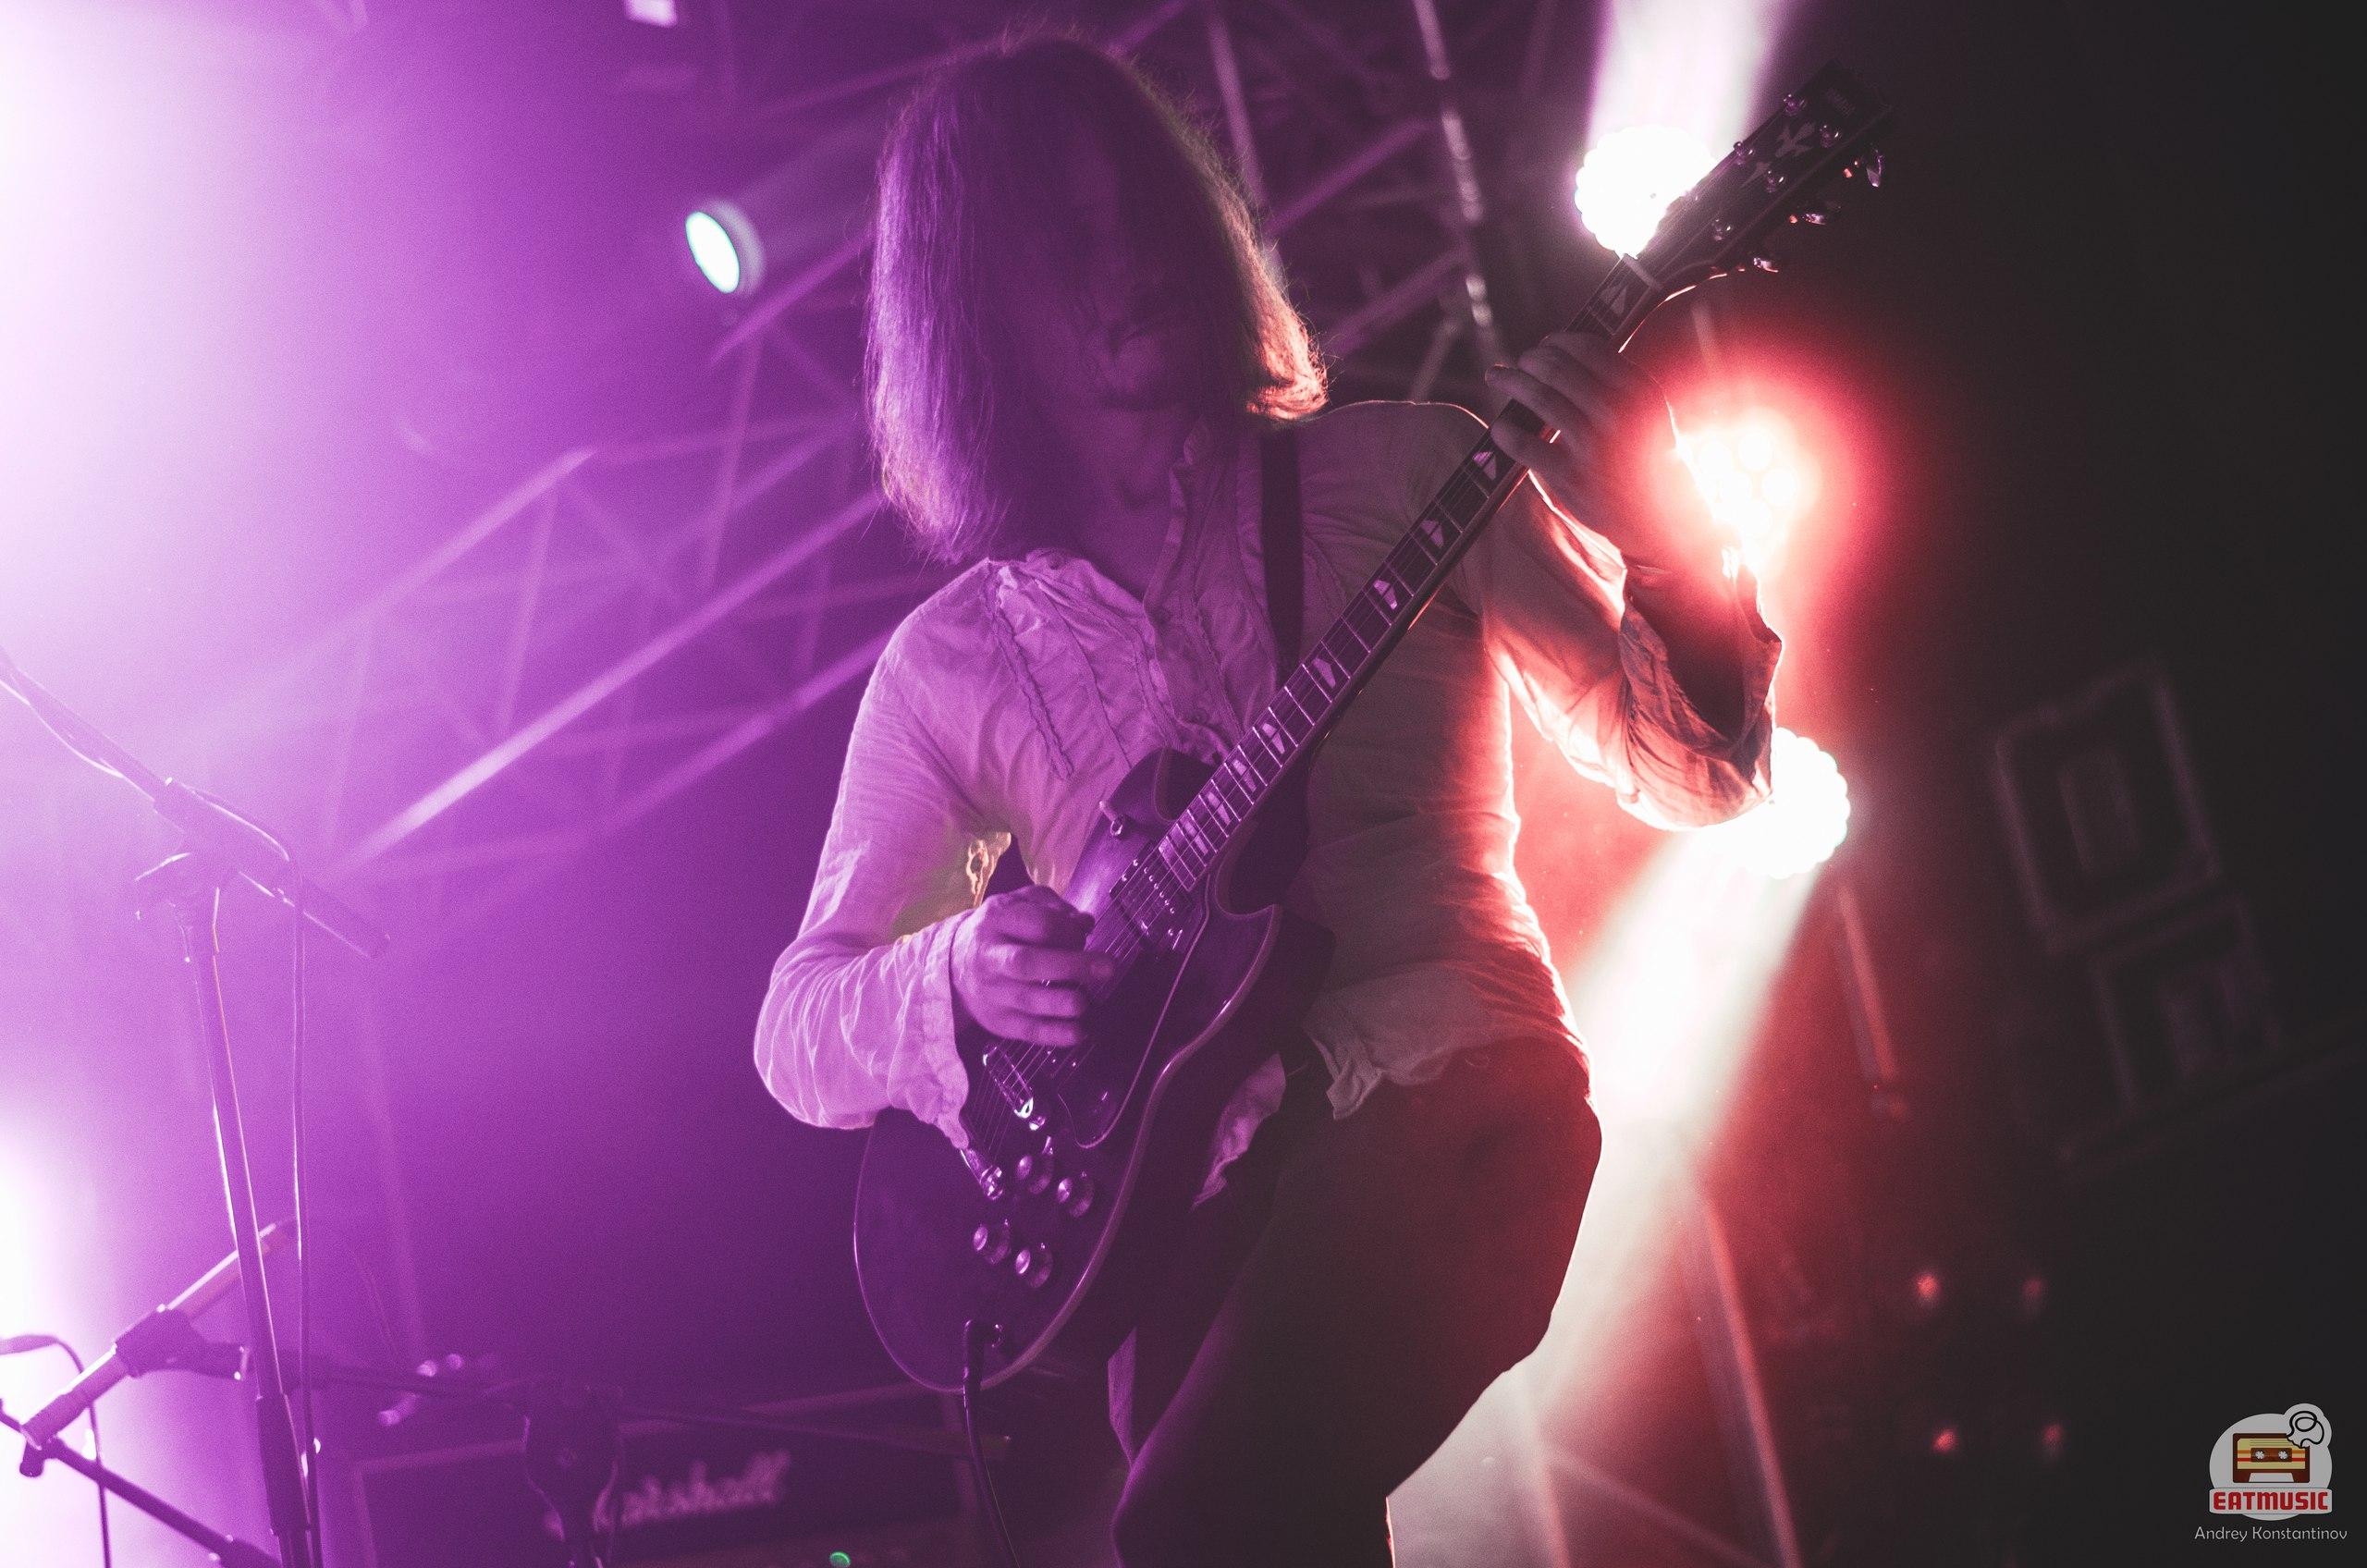 Концерт TRUCKFIGHTERS в Москве 22.05.2017, группа Vice Versa: репортаж, фото Андрей Константинов